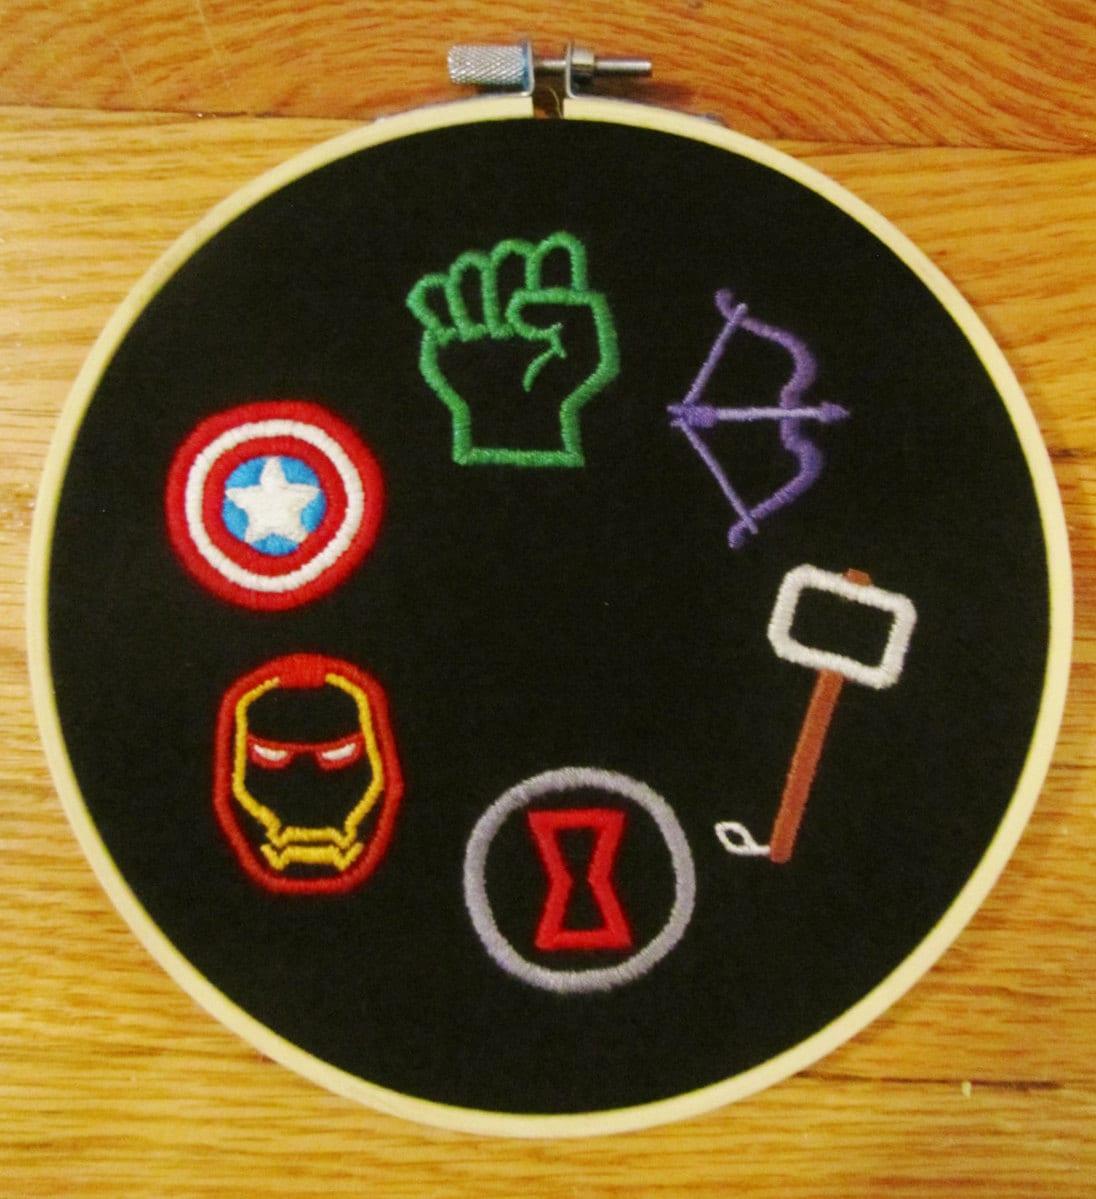 Embroidery Hoop Art Avengers Symbols Comic Book Logo Iron